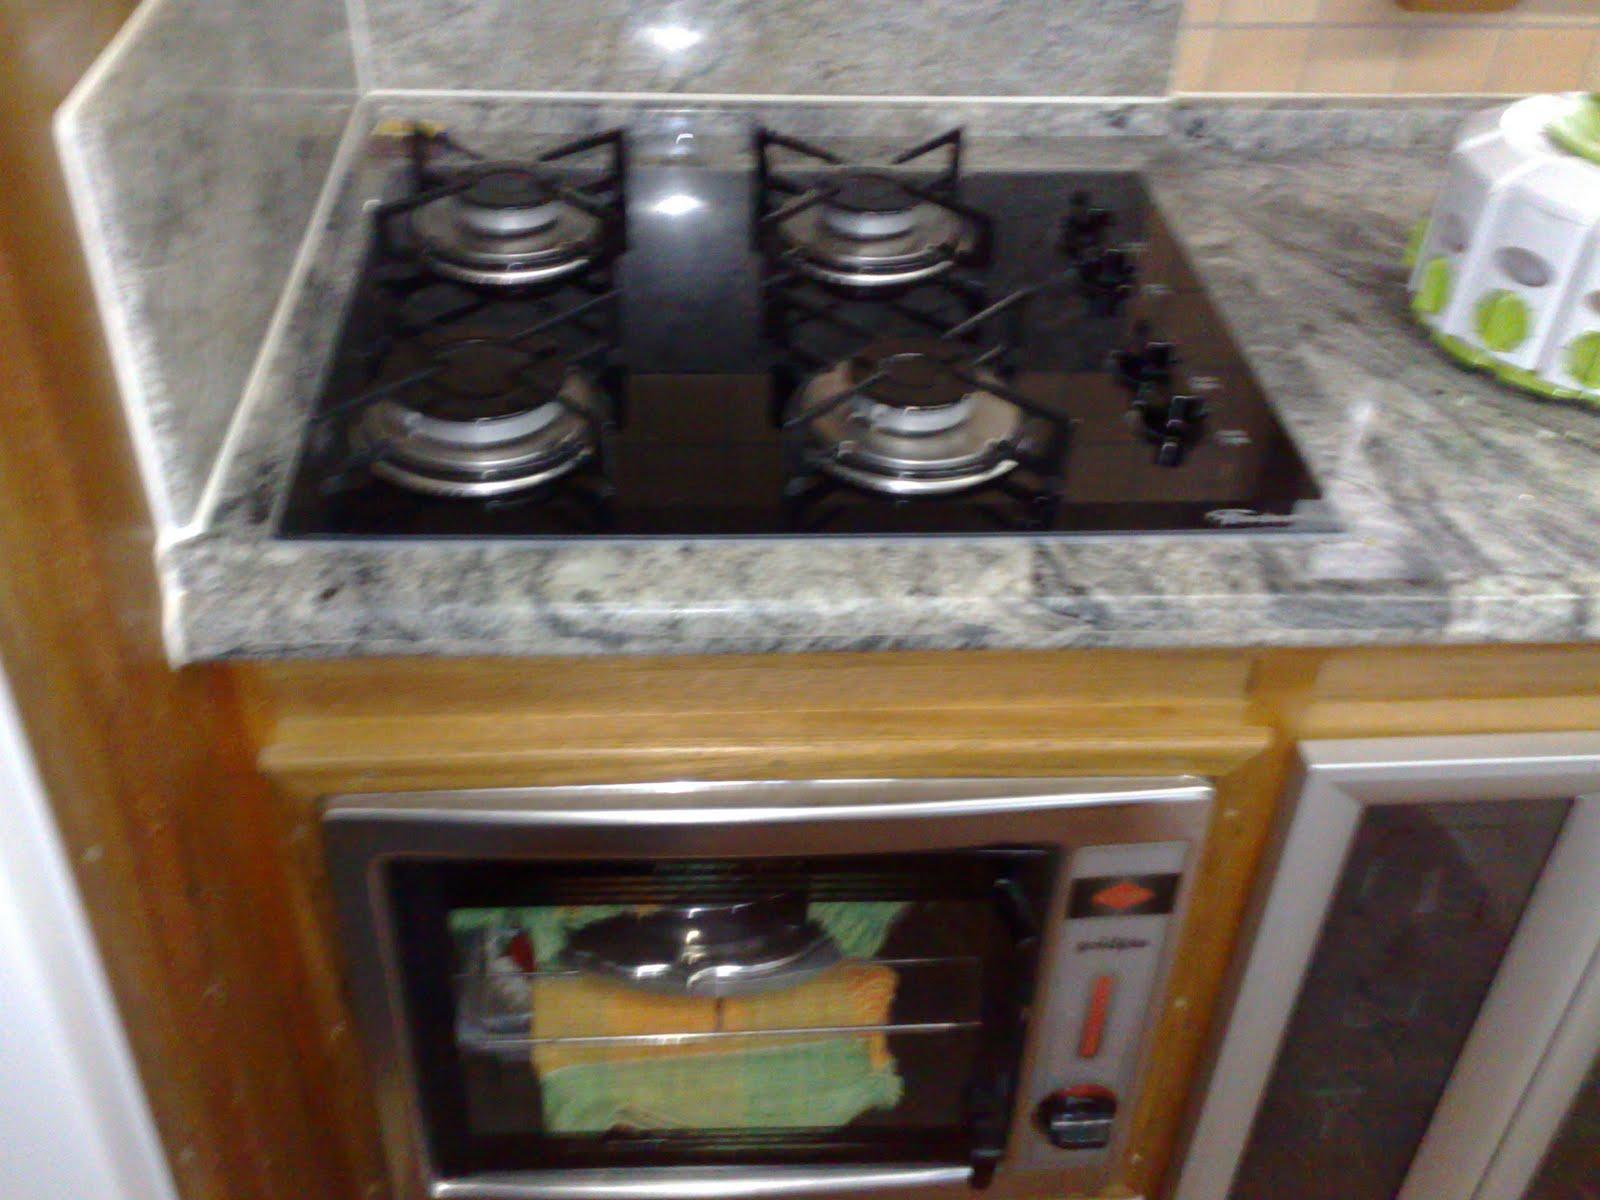 fogao cooktop bonito 1